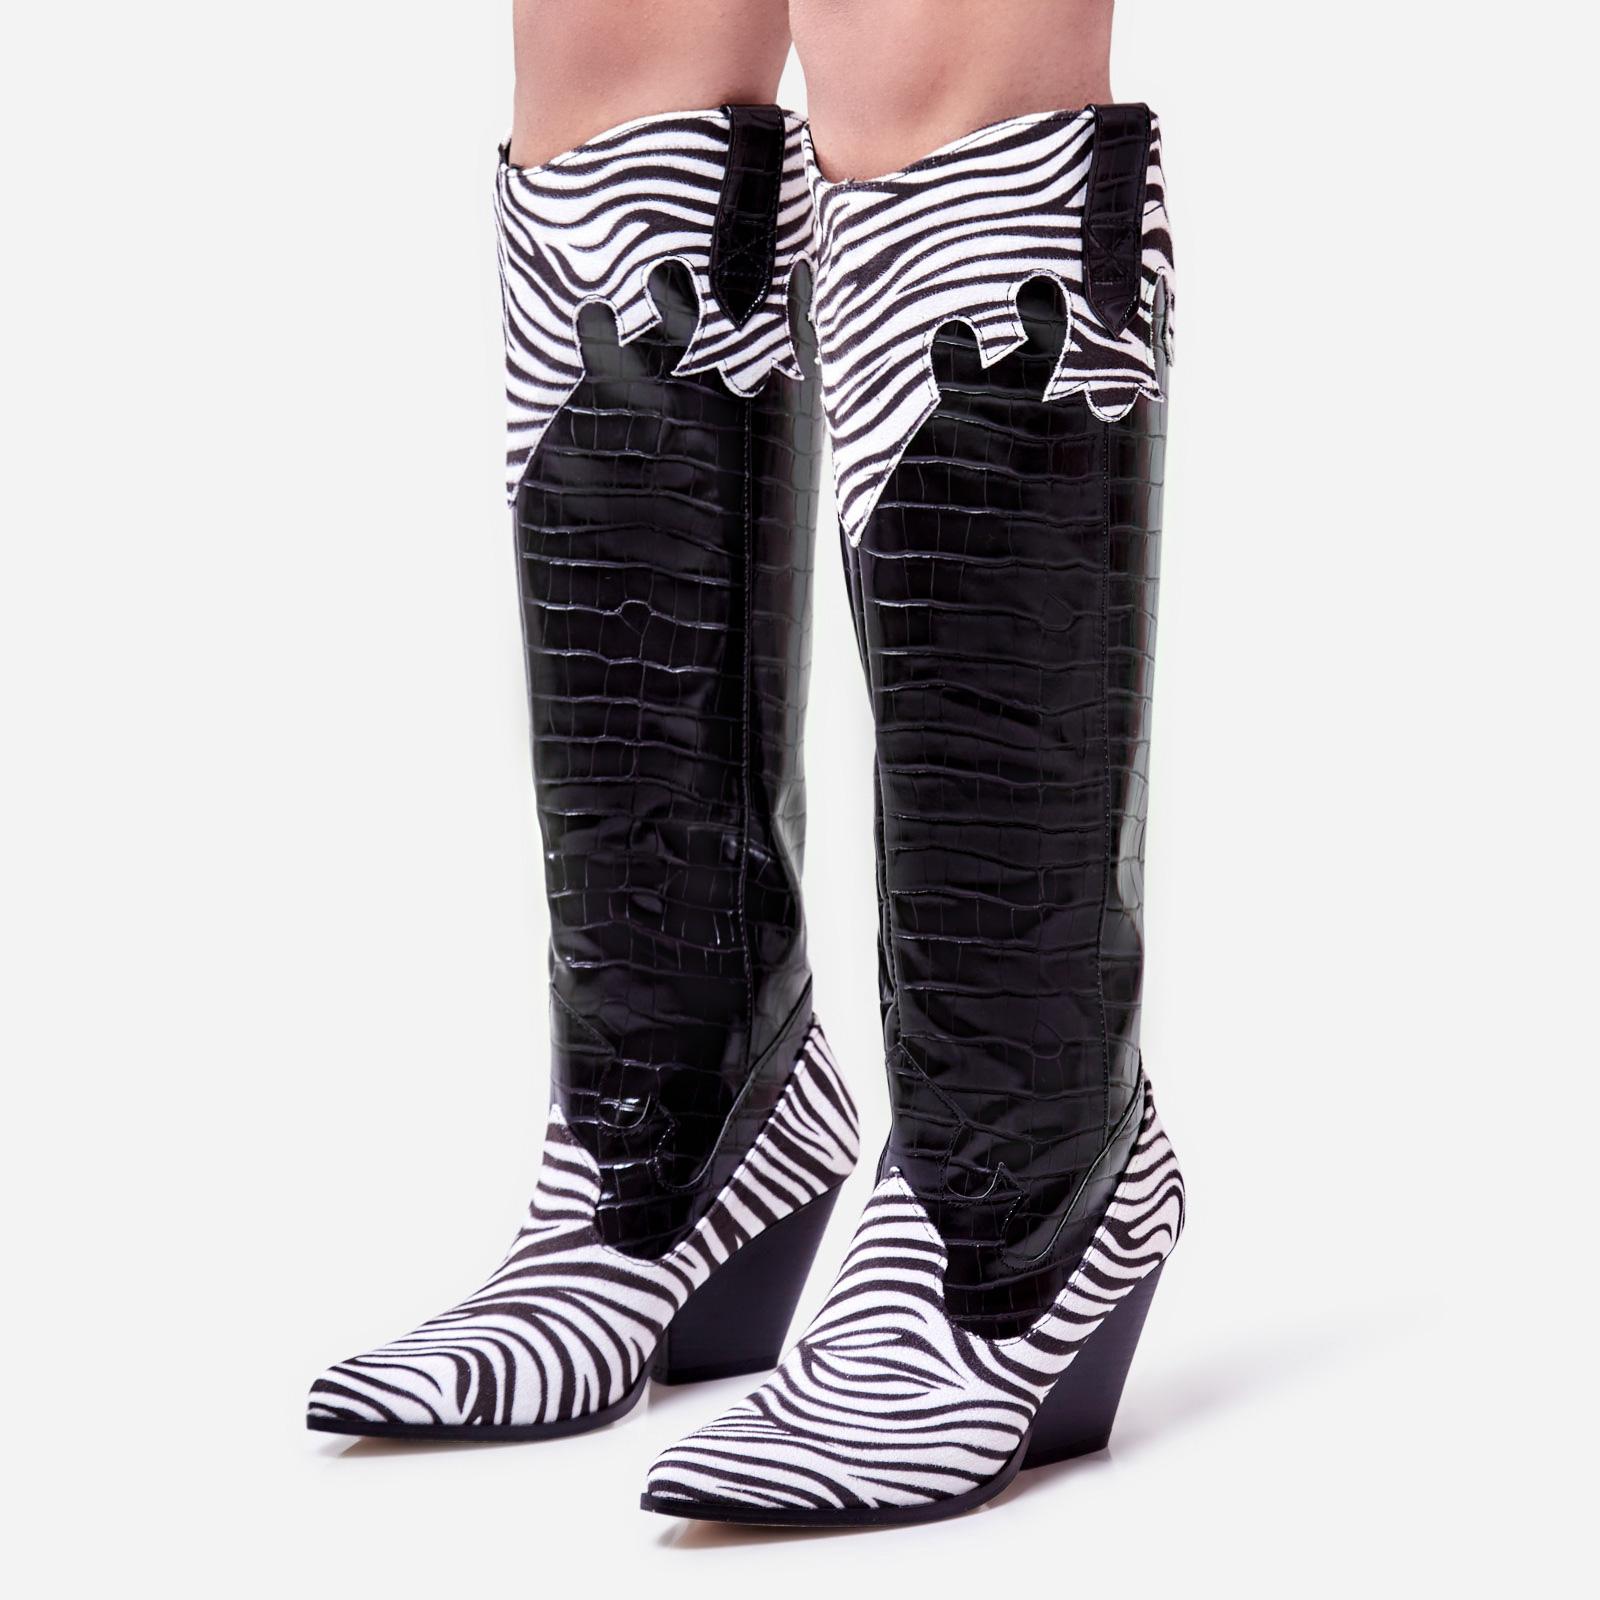 Callie Zebra Print Detail Knee High Western Long Boot In Black Croc Print Faux Leather